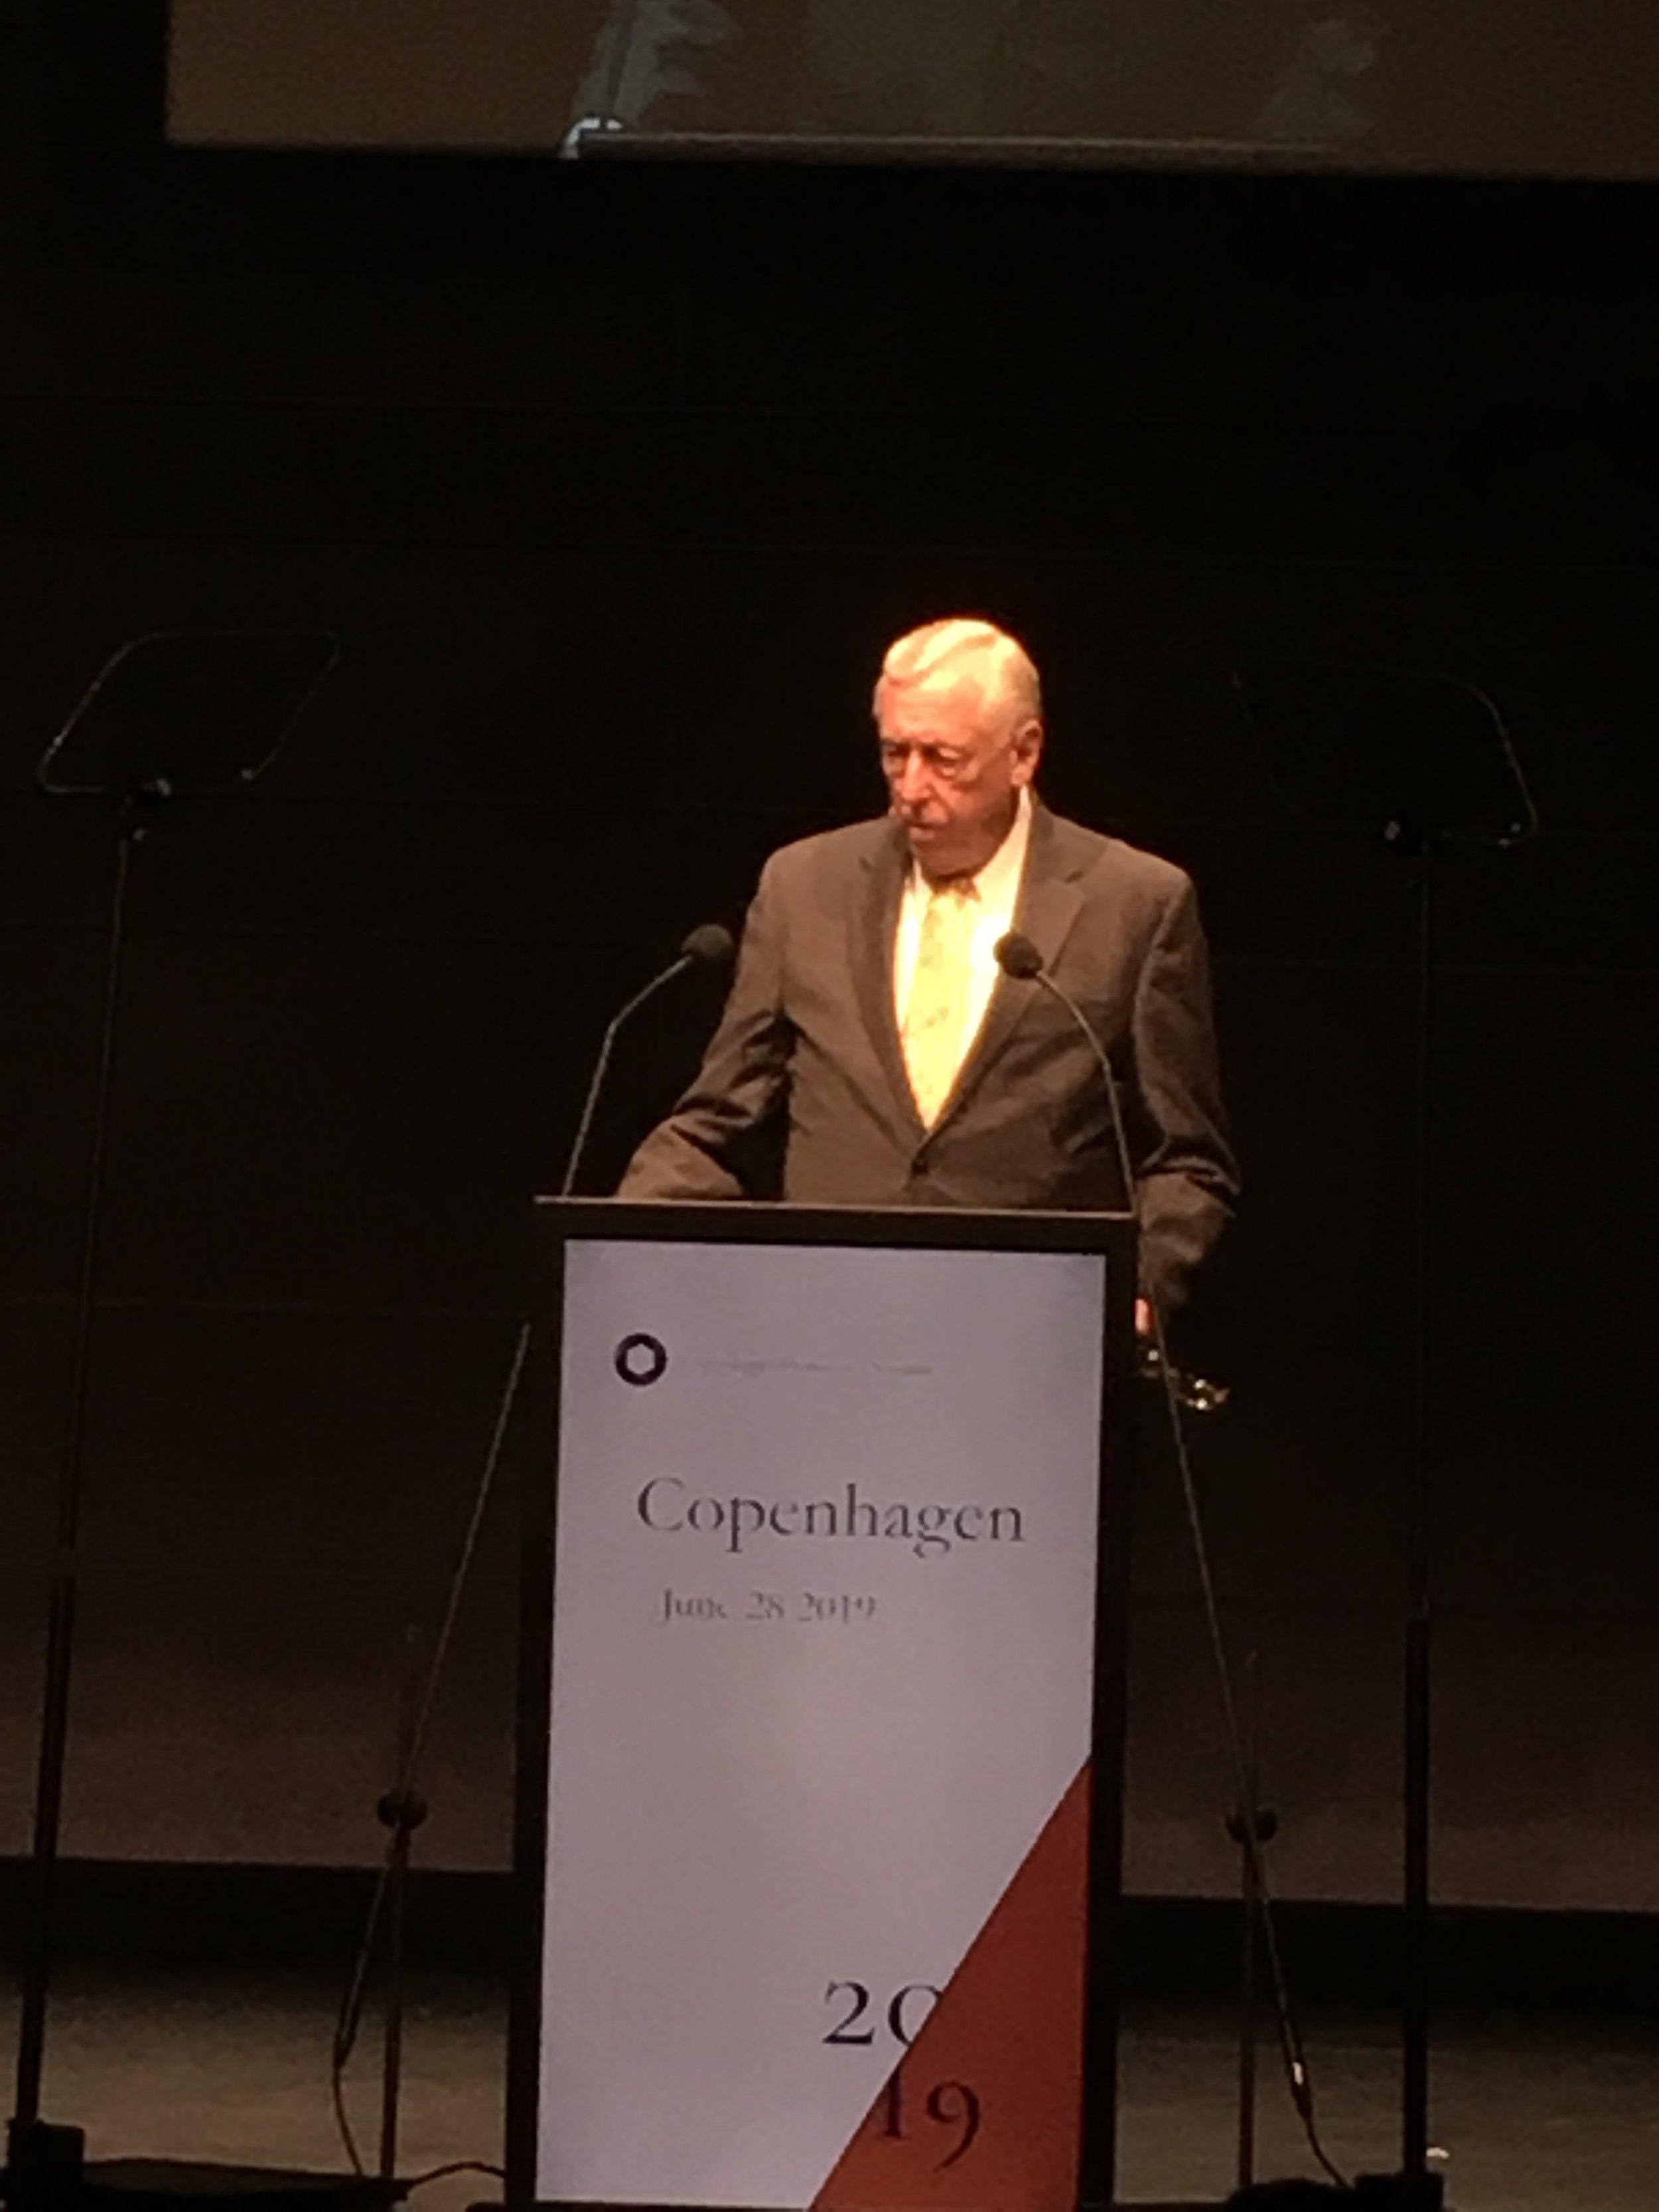 CopenhagenDemocracySummit_03_Hoyer.JPG